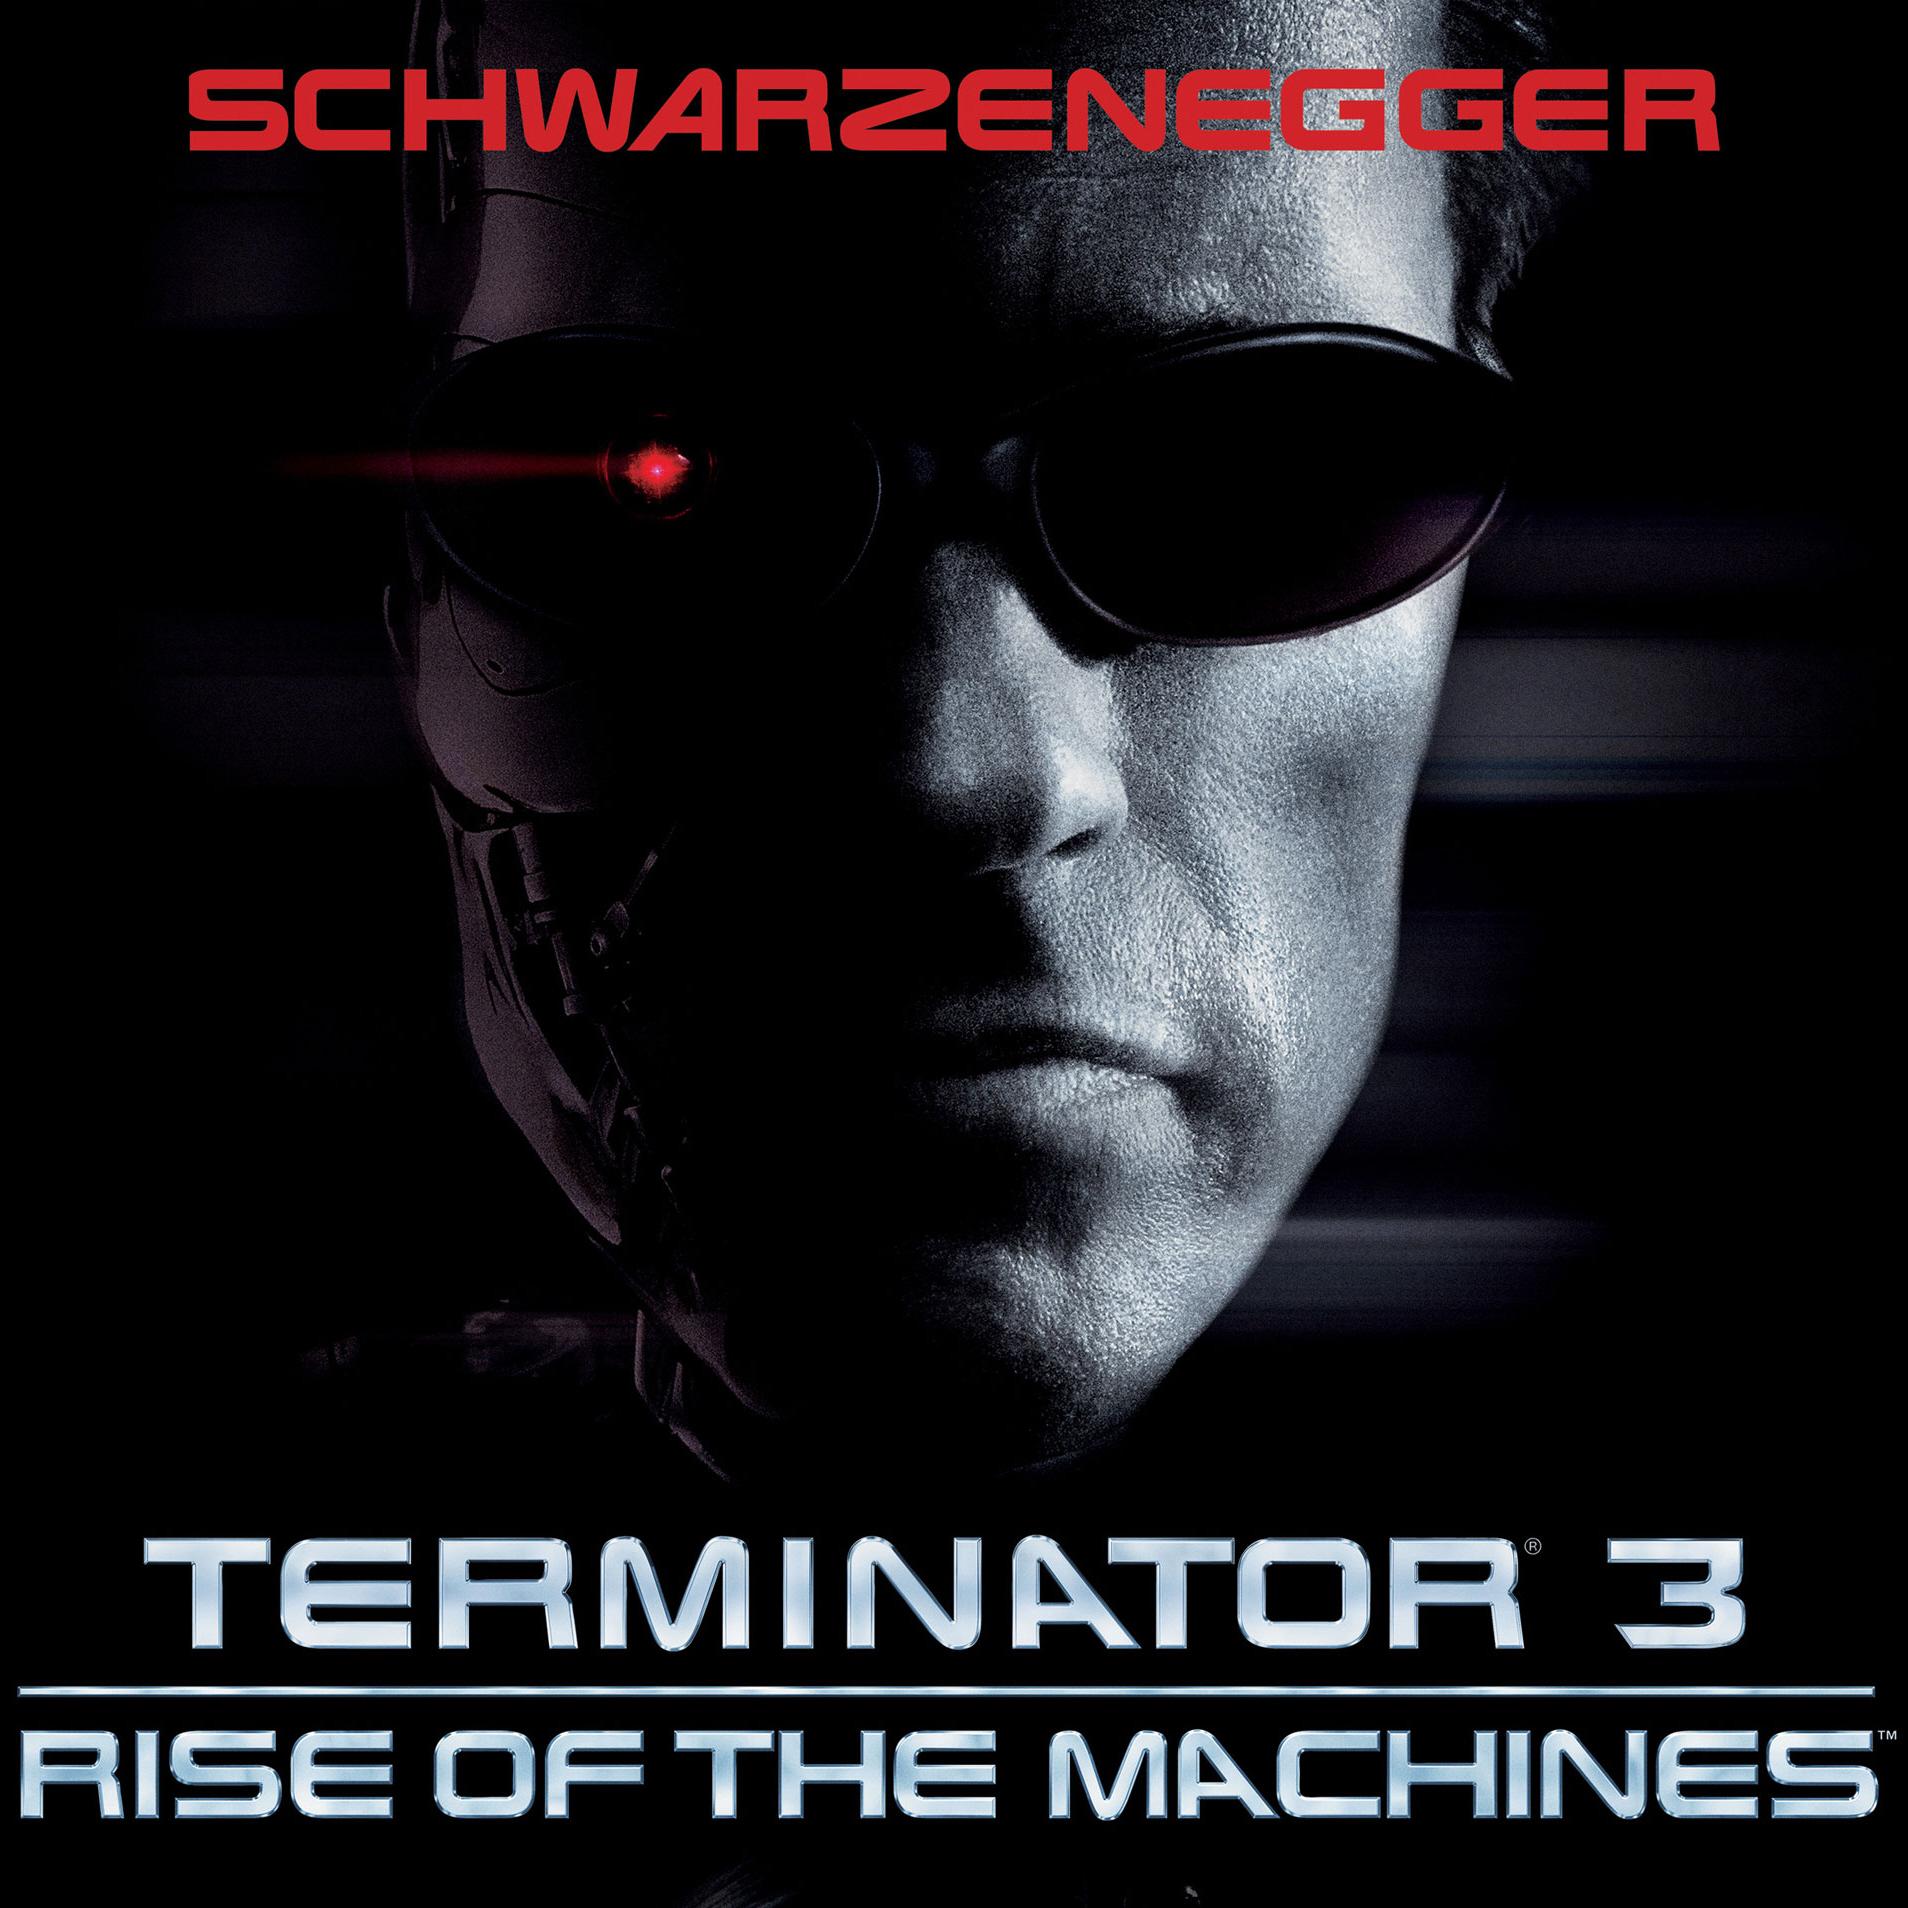 terminator 3 rise of - photo #10